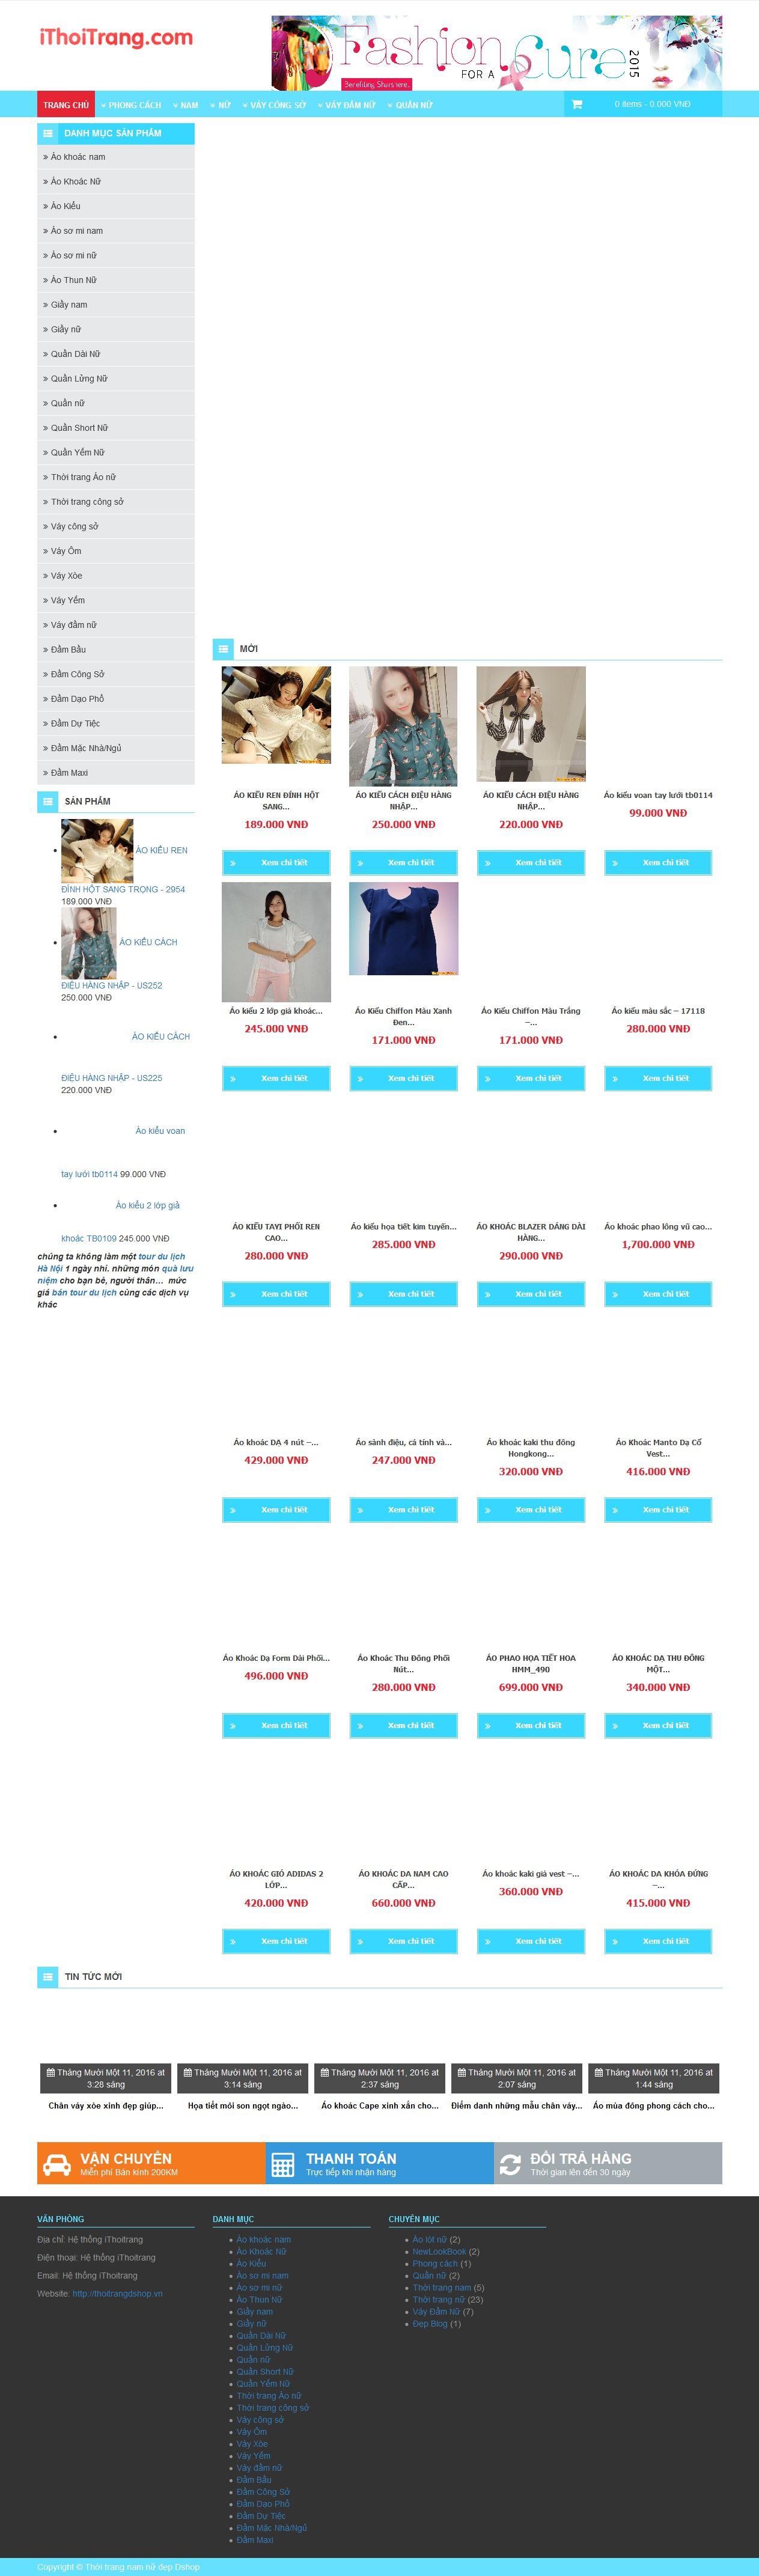 Mẫu website thời trang 10335